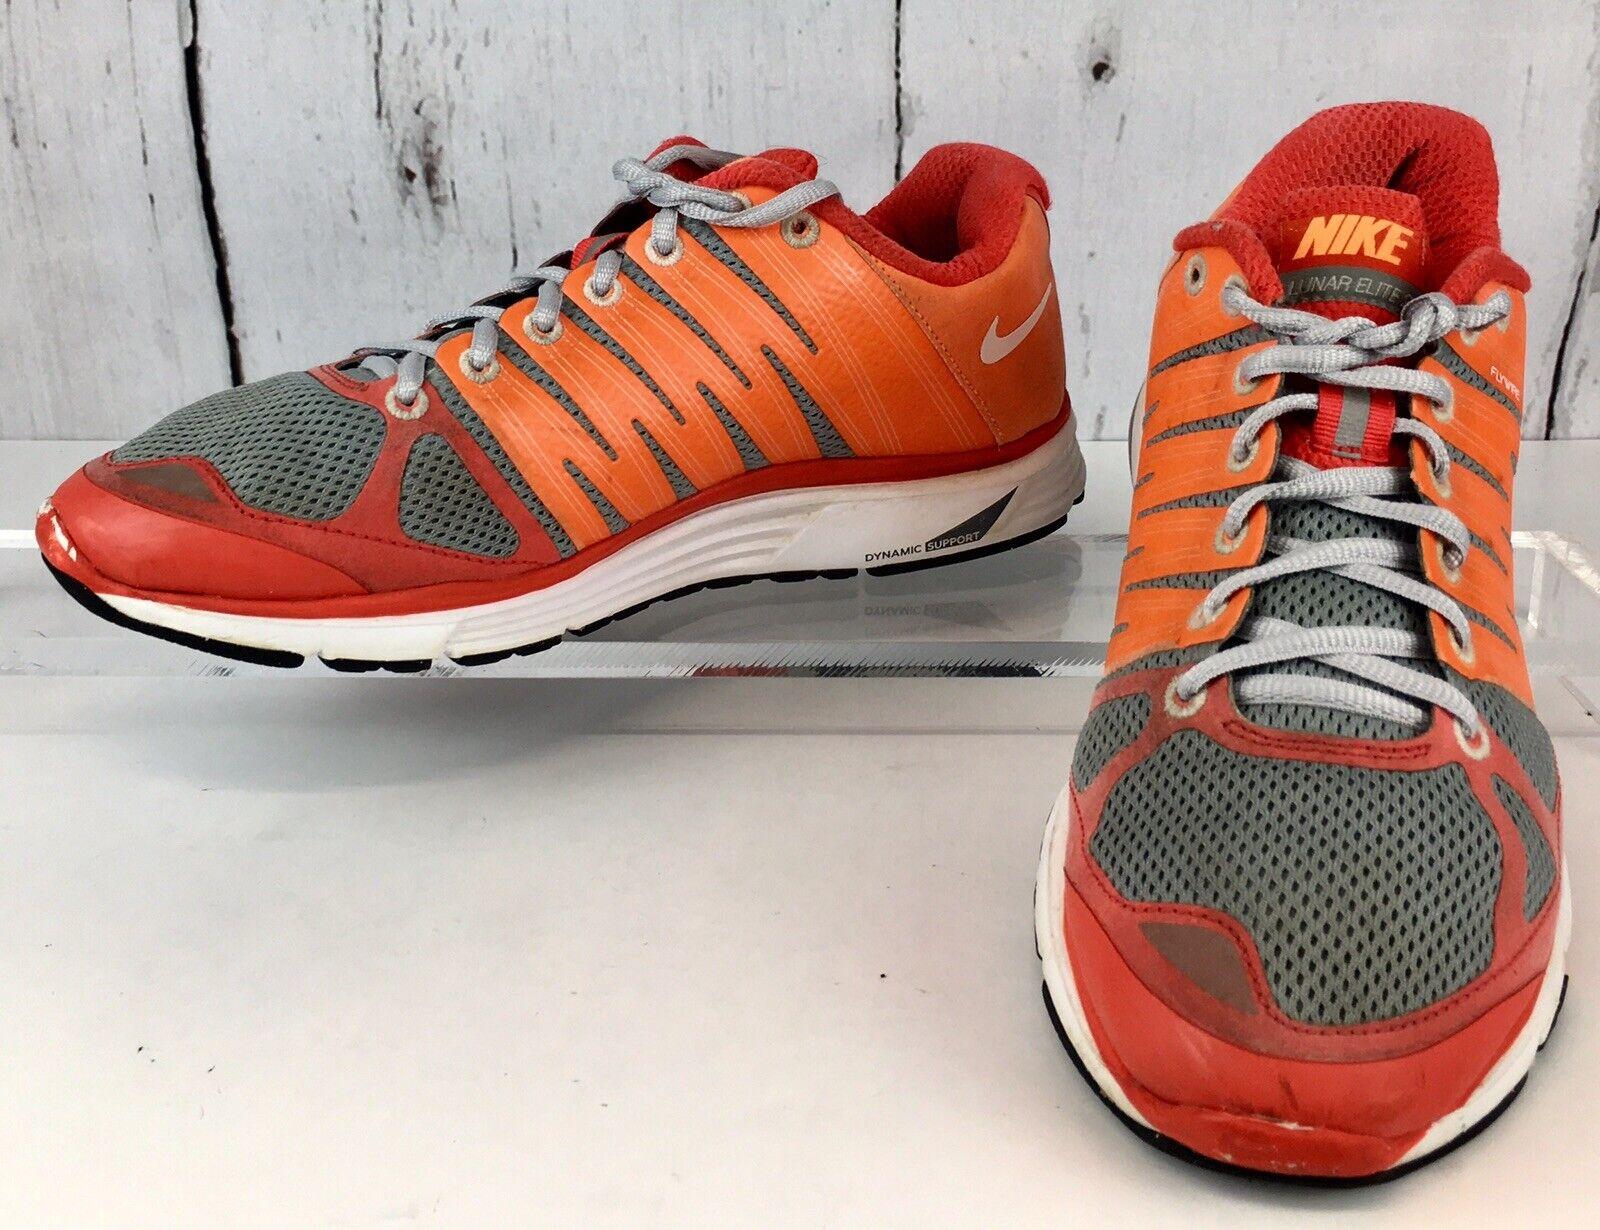 factory price 3418e e08f0 ... nike lunarlon lunarlon lunarlon lunar elite 2 flywire scarpe da corsa,  ...